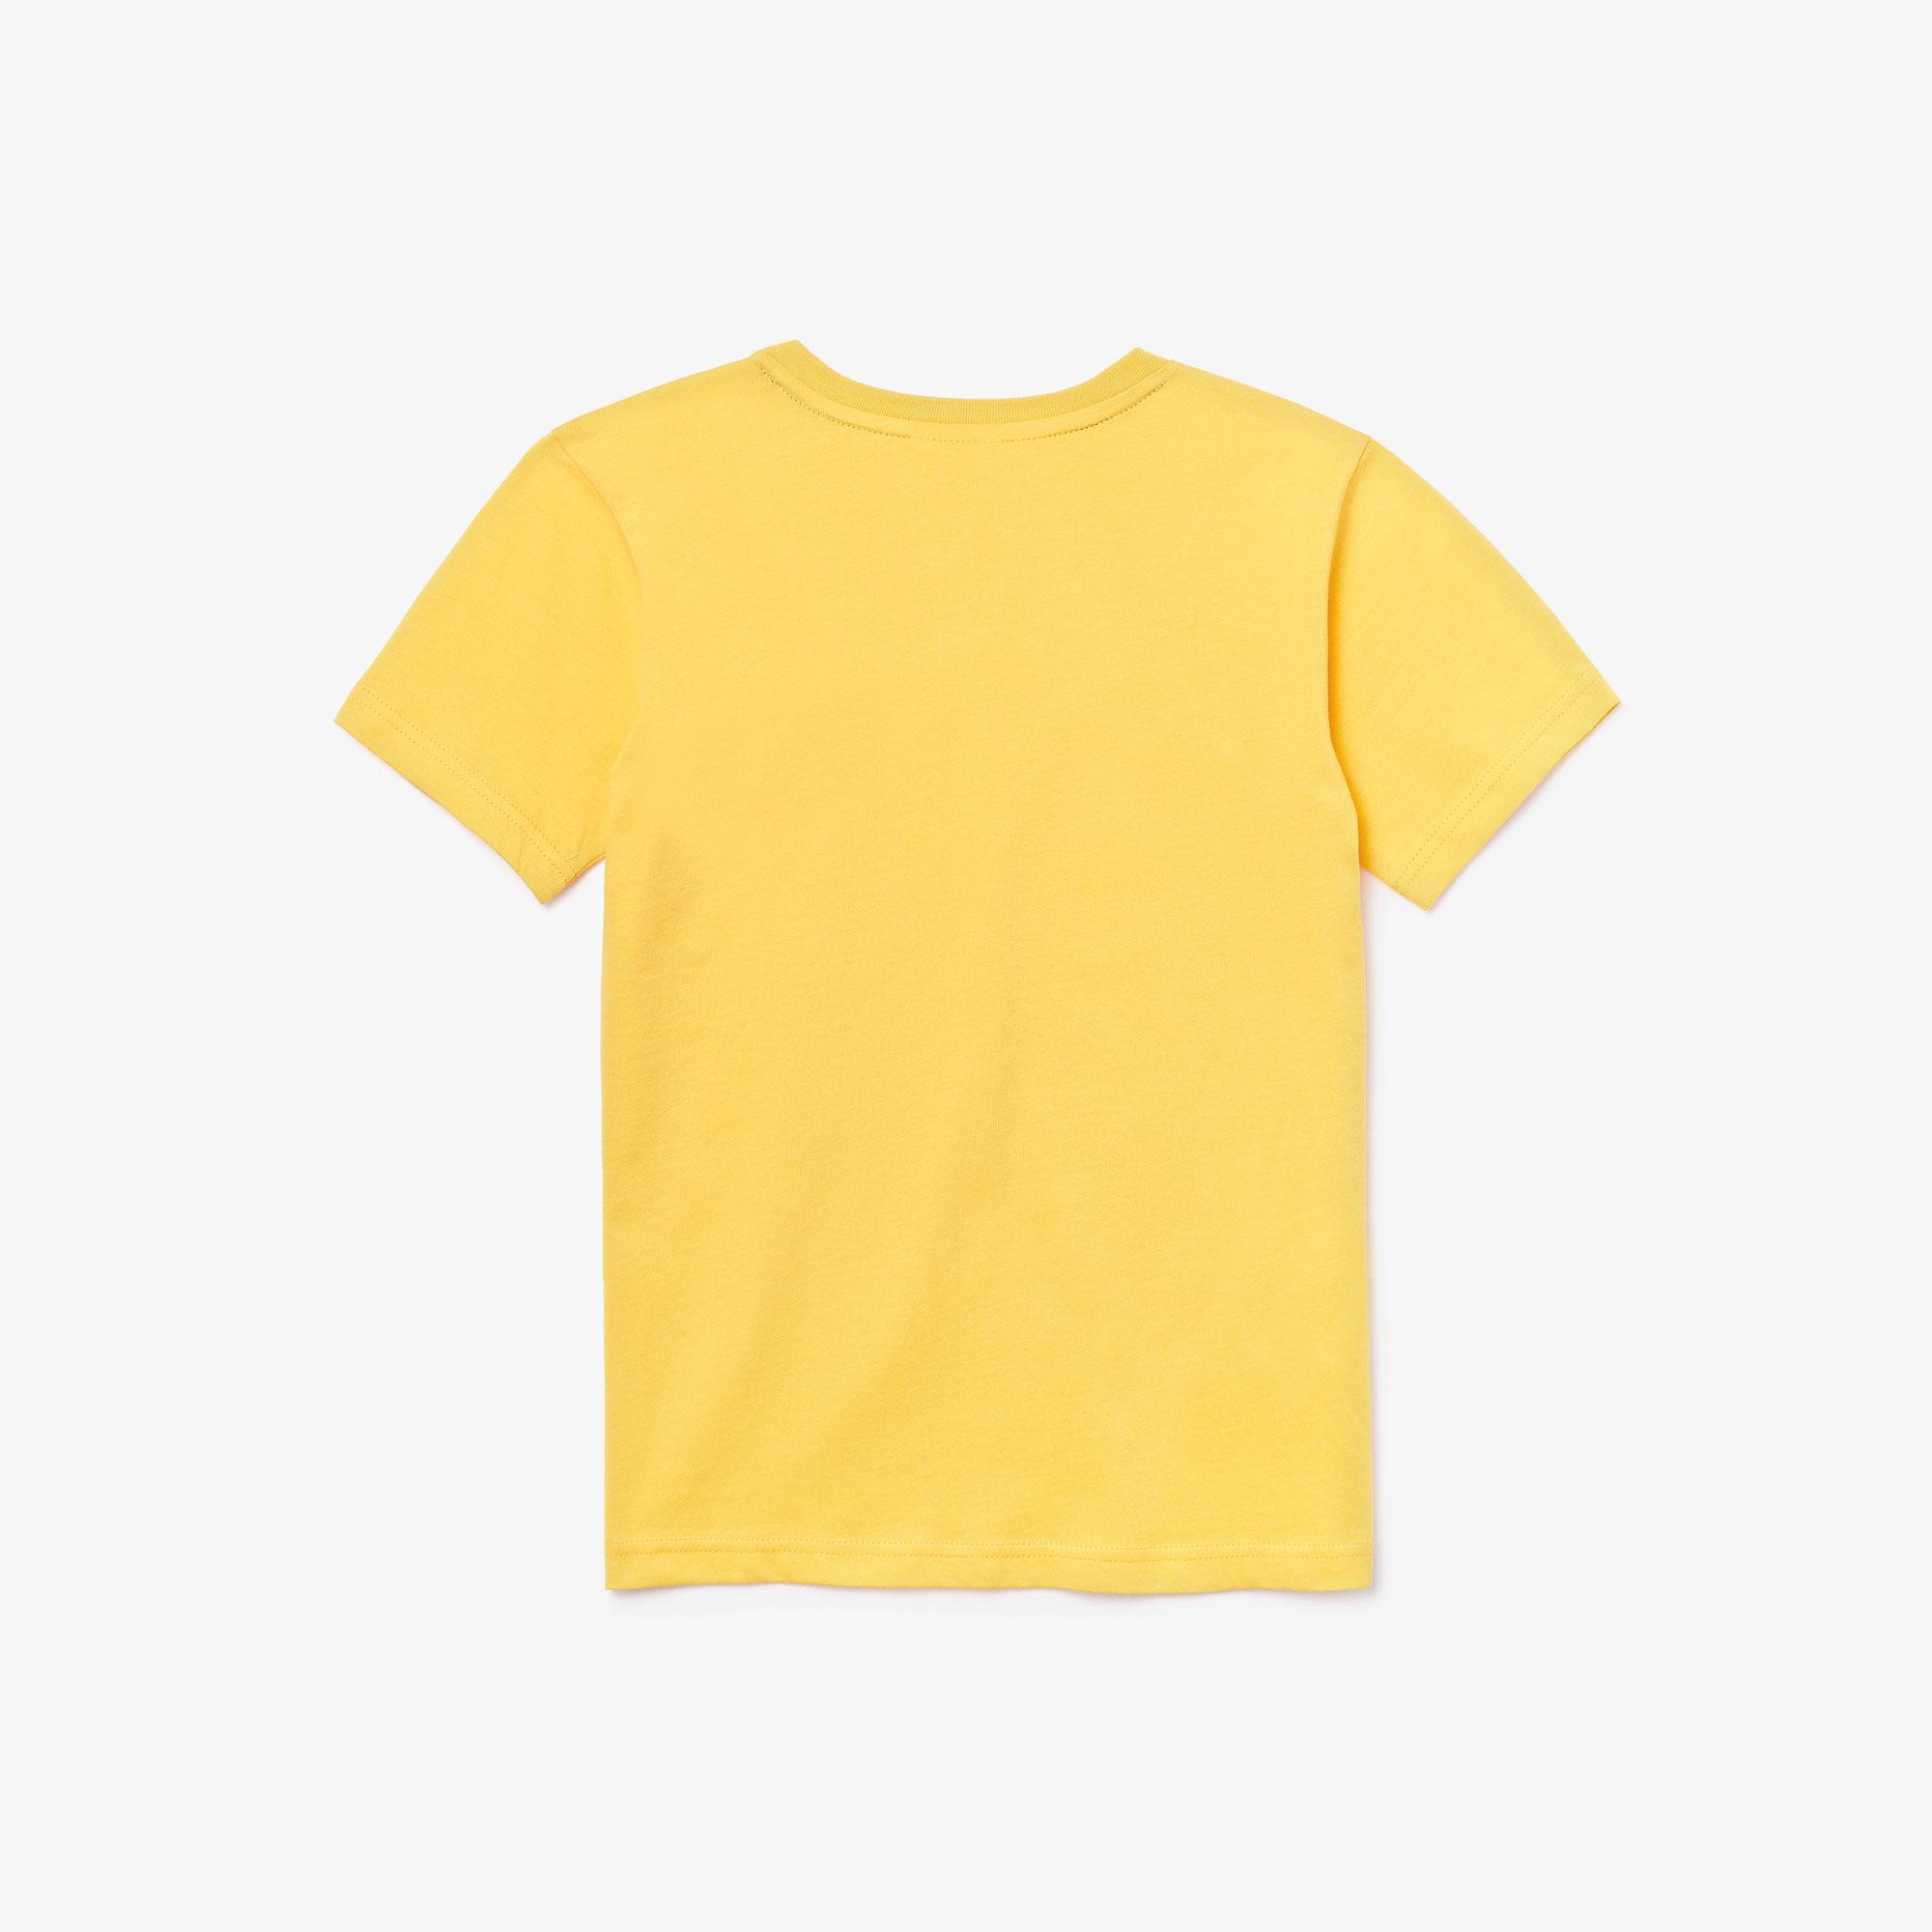 Lacoste Boys' Crew Neck Cotton Jersey T-Shirt